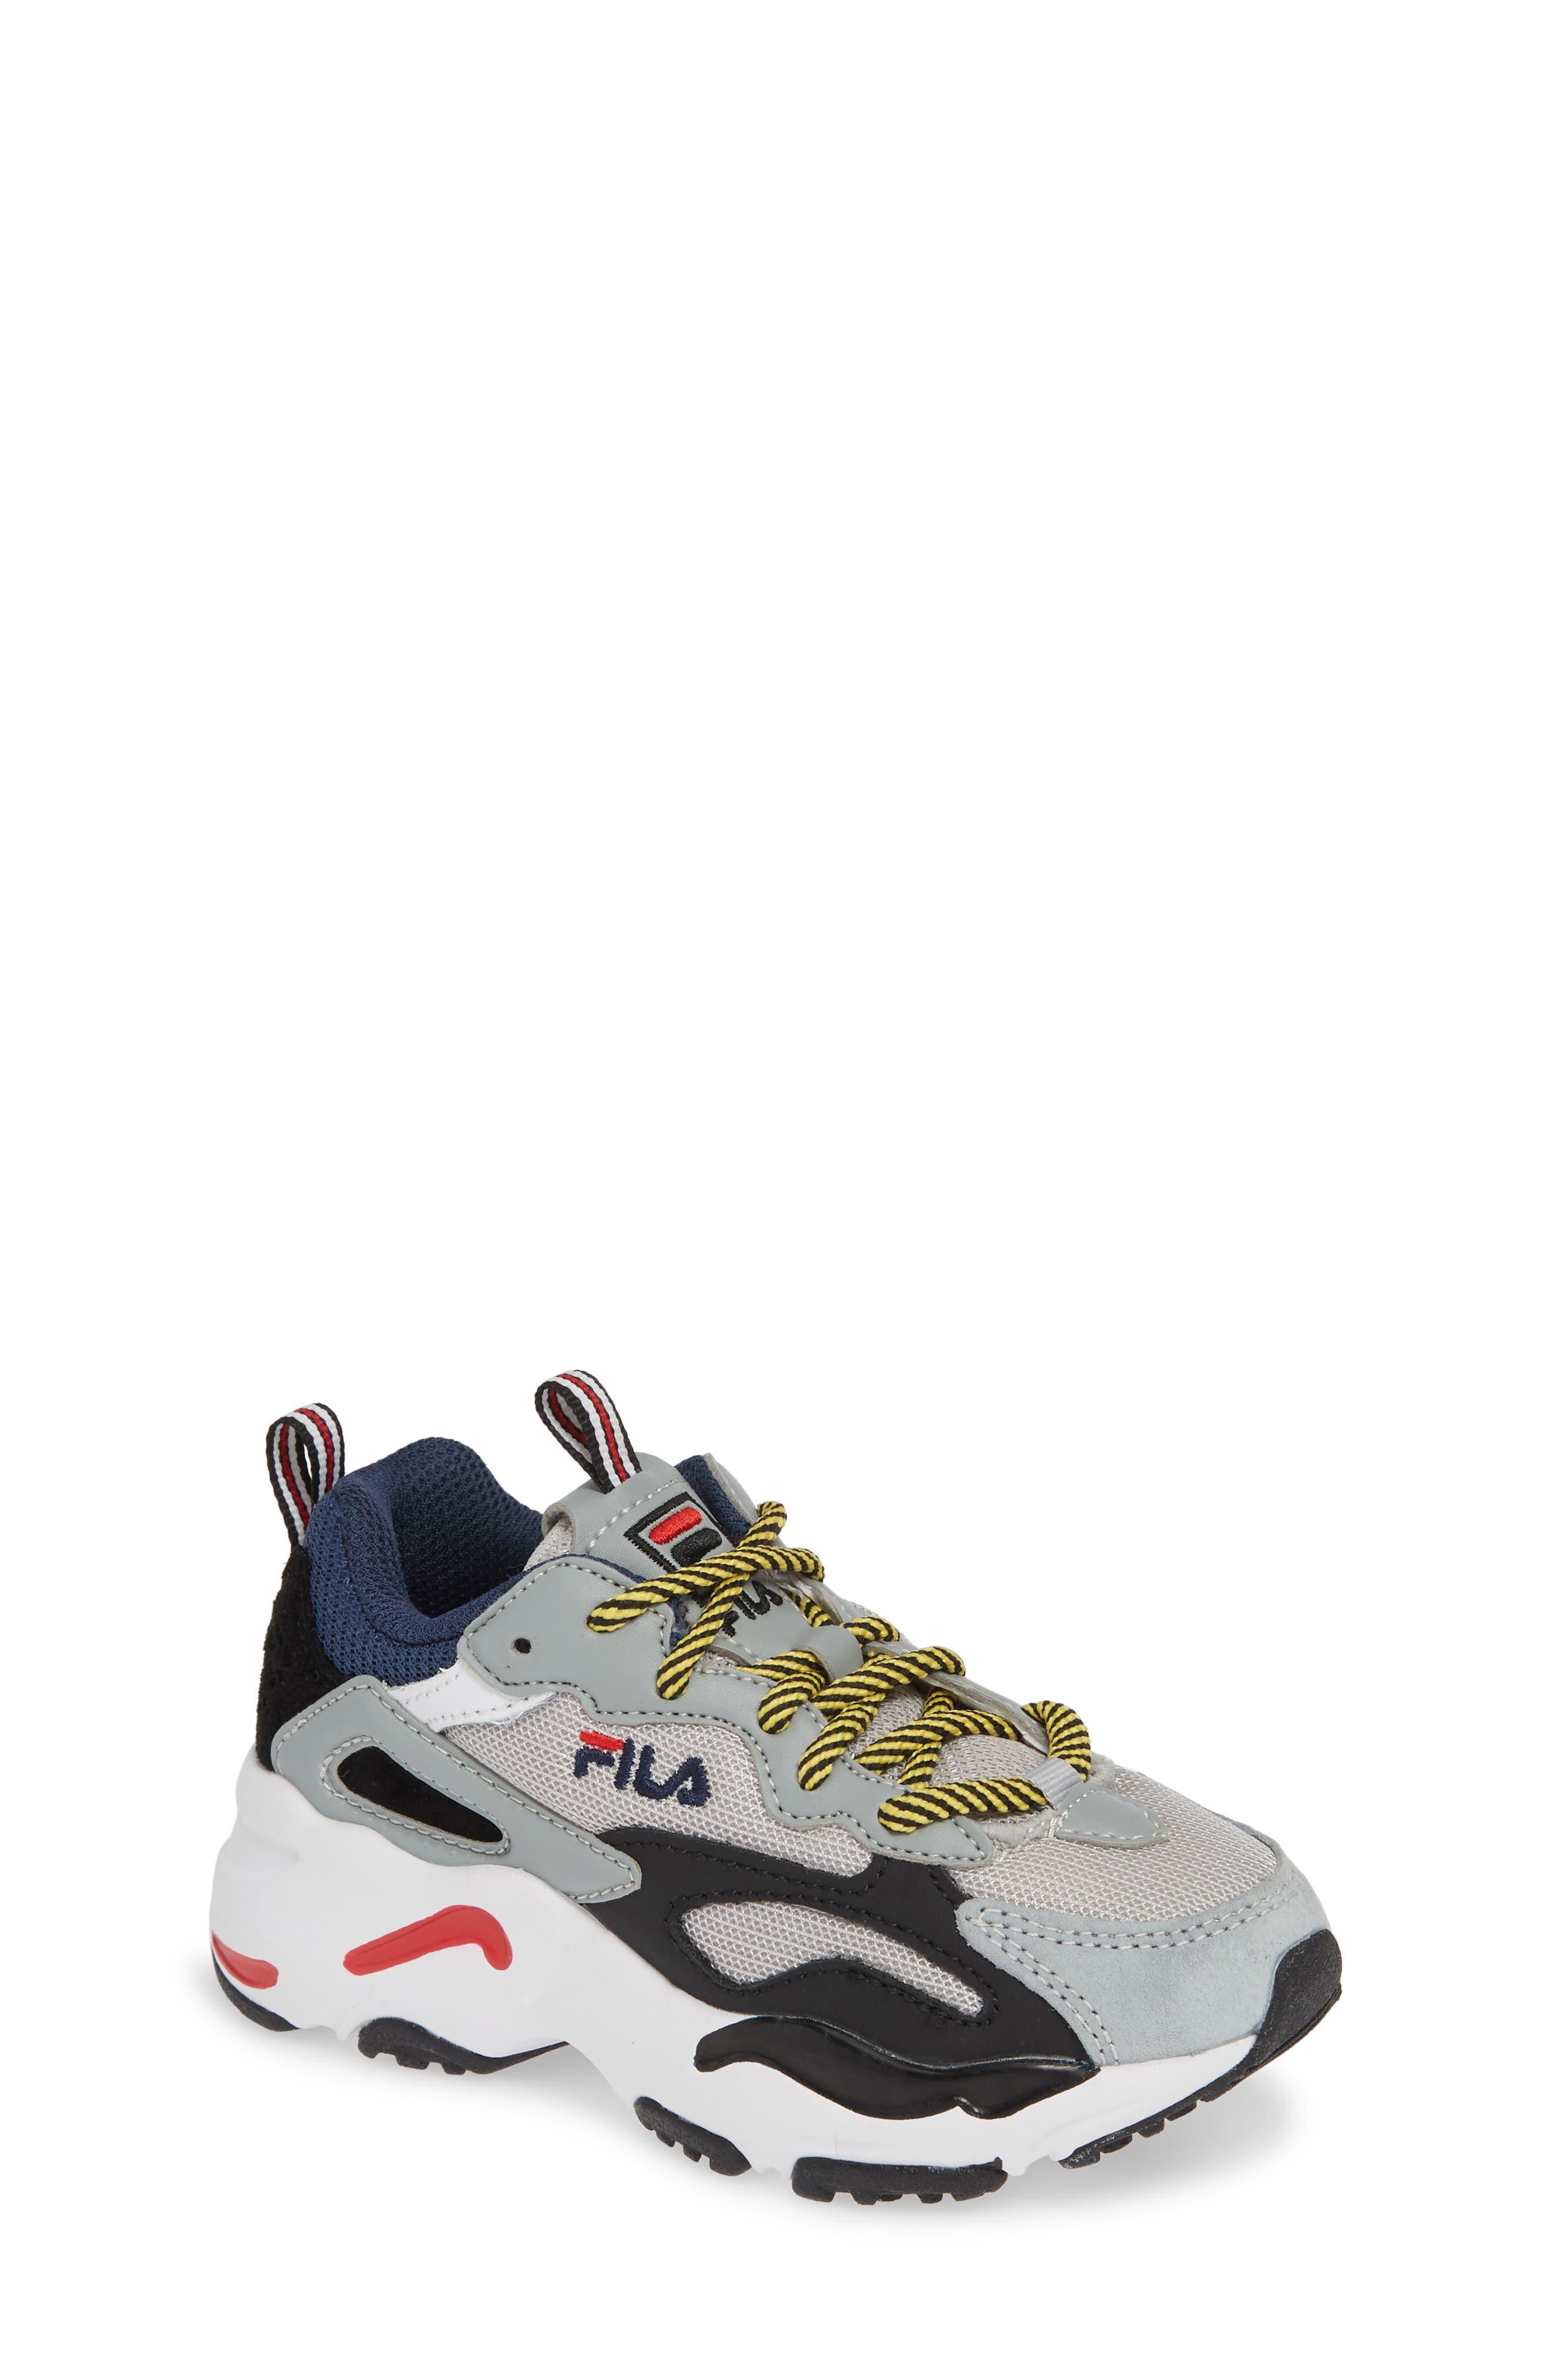 FILA Ray Tracer Sneaker (Toddler